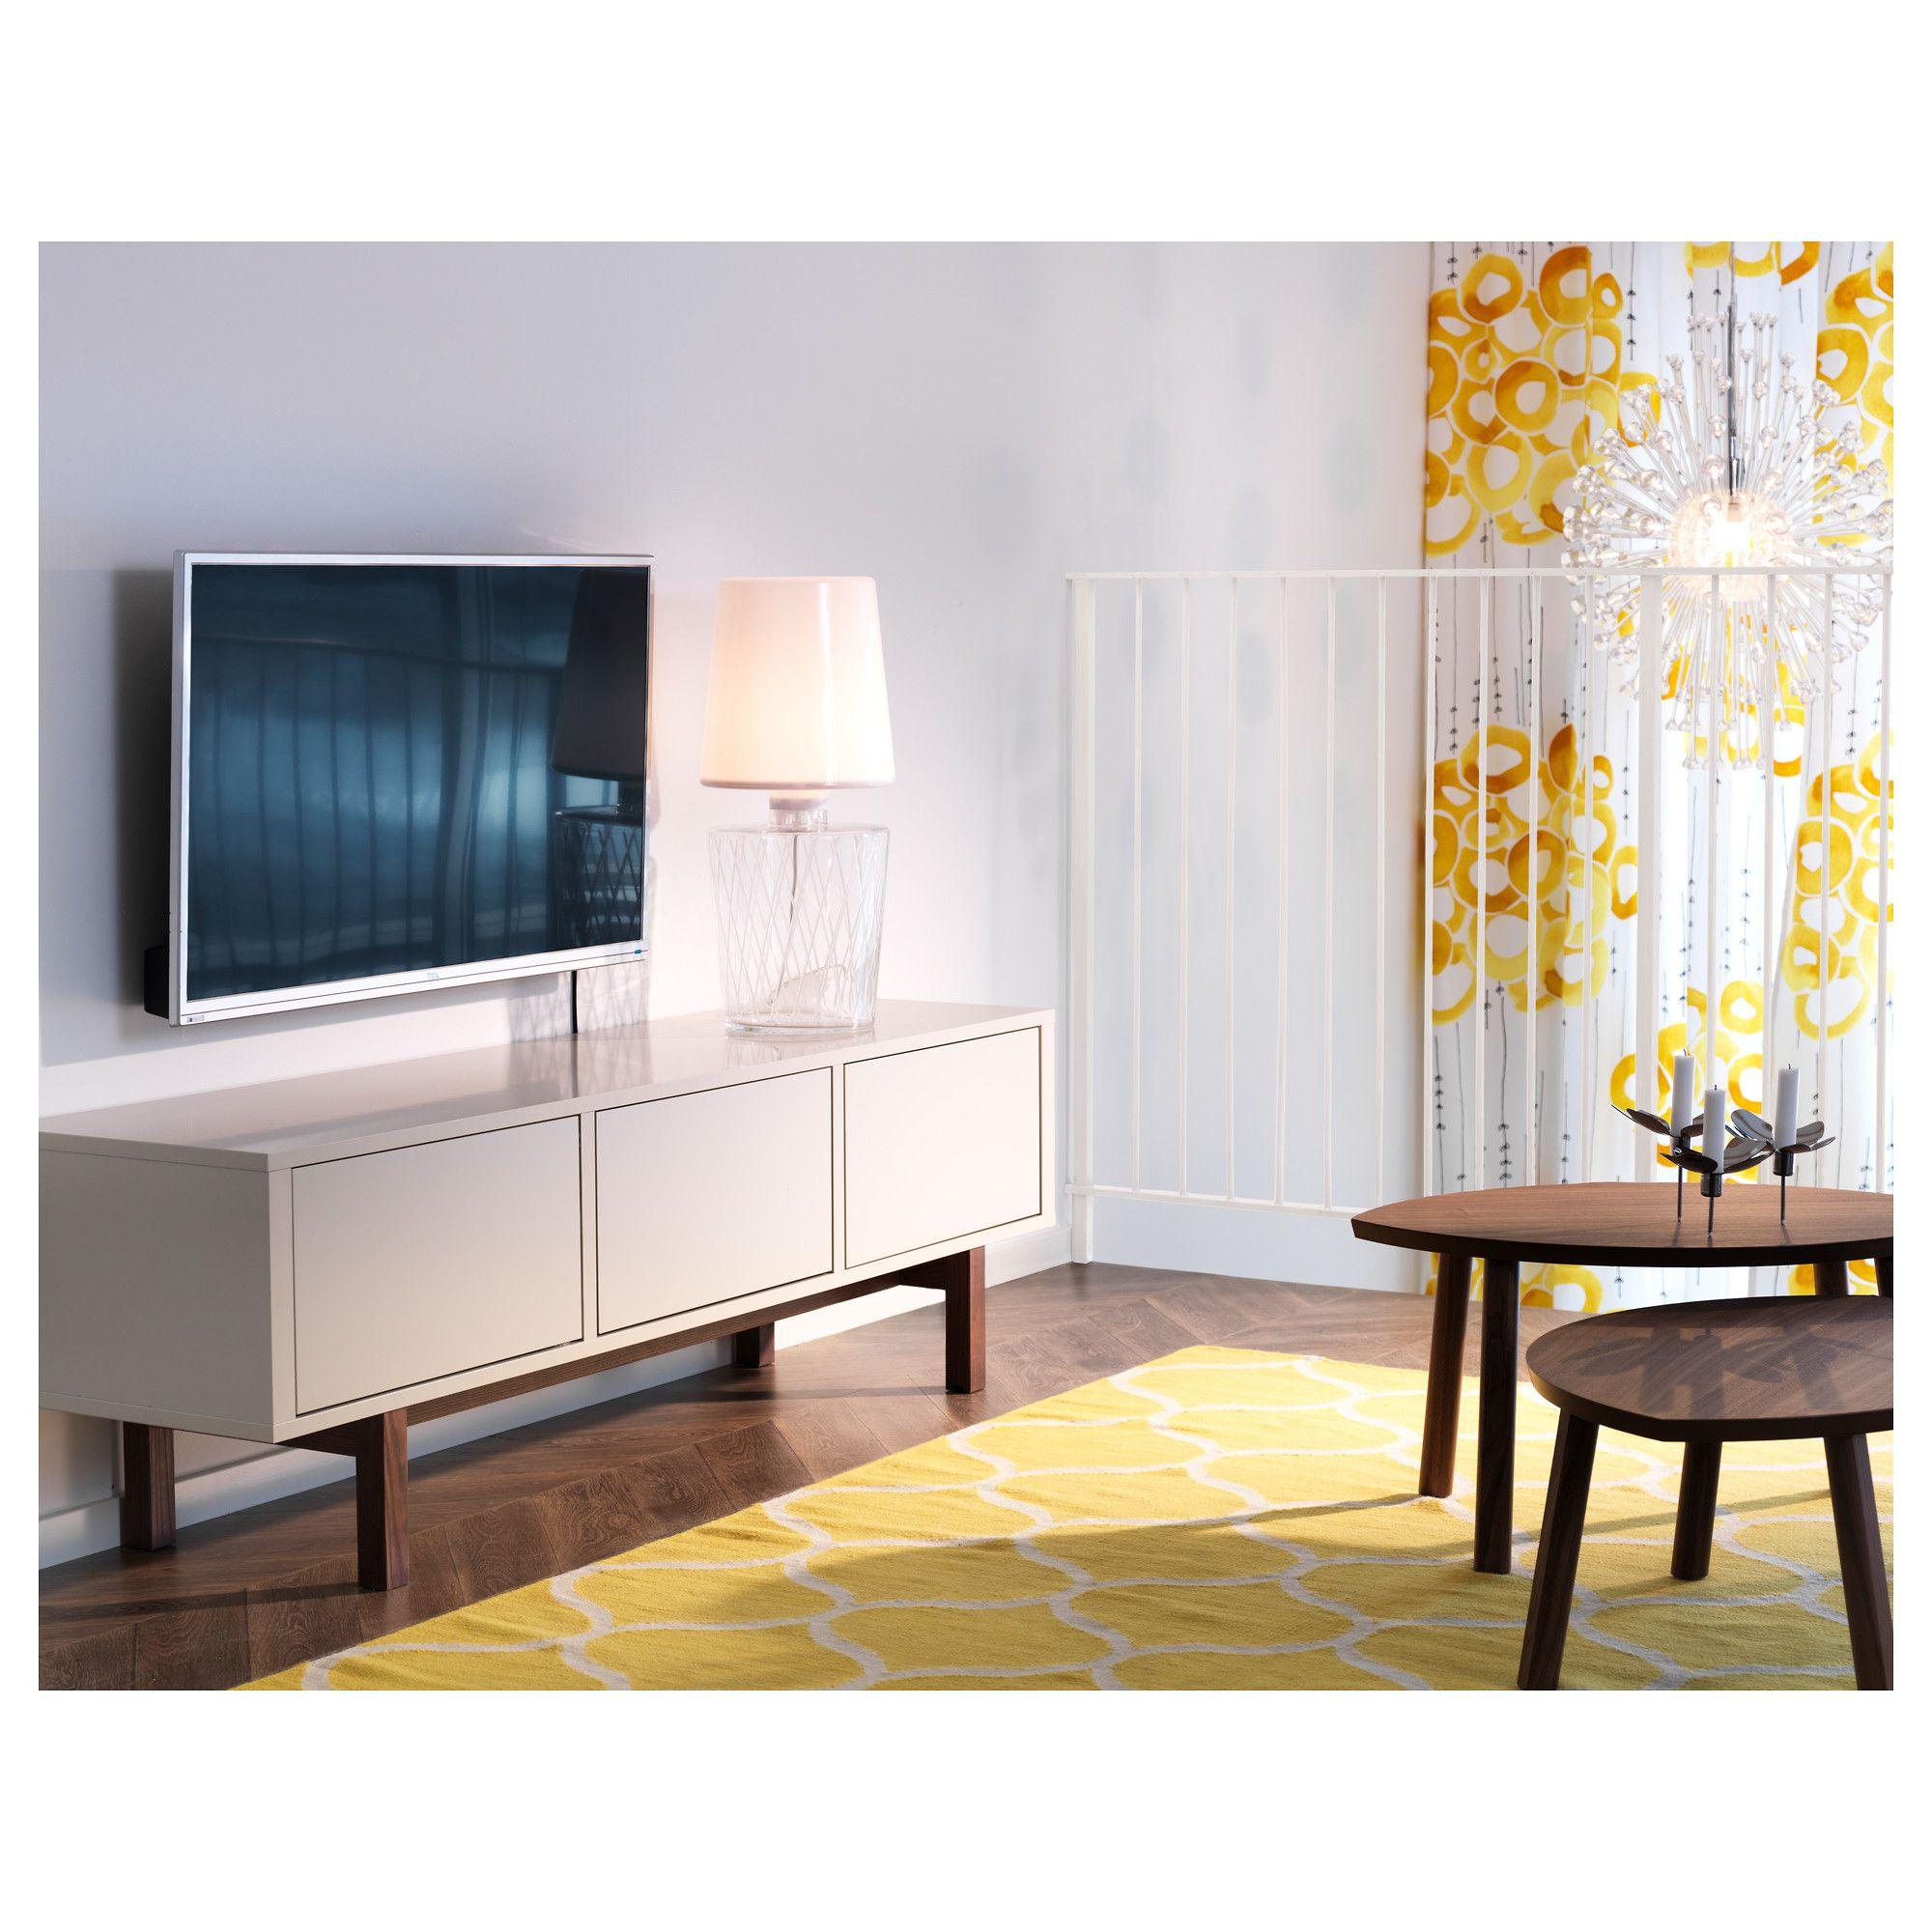 STOCKHOLM Χαλί, χαμηλή πλέξη - IKEA   50s living room   Pinterest ...